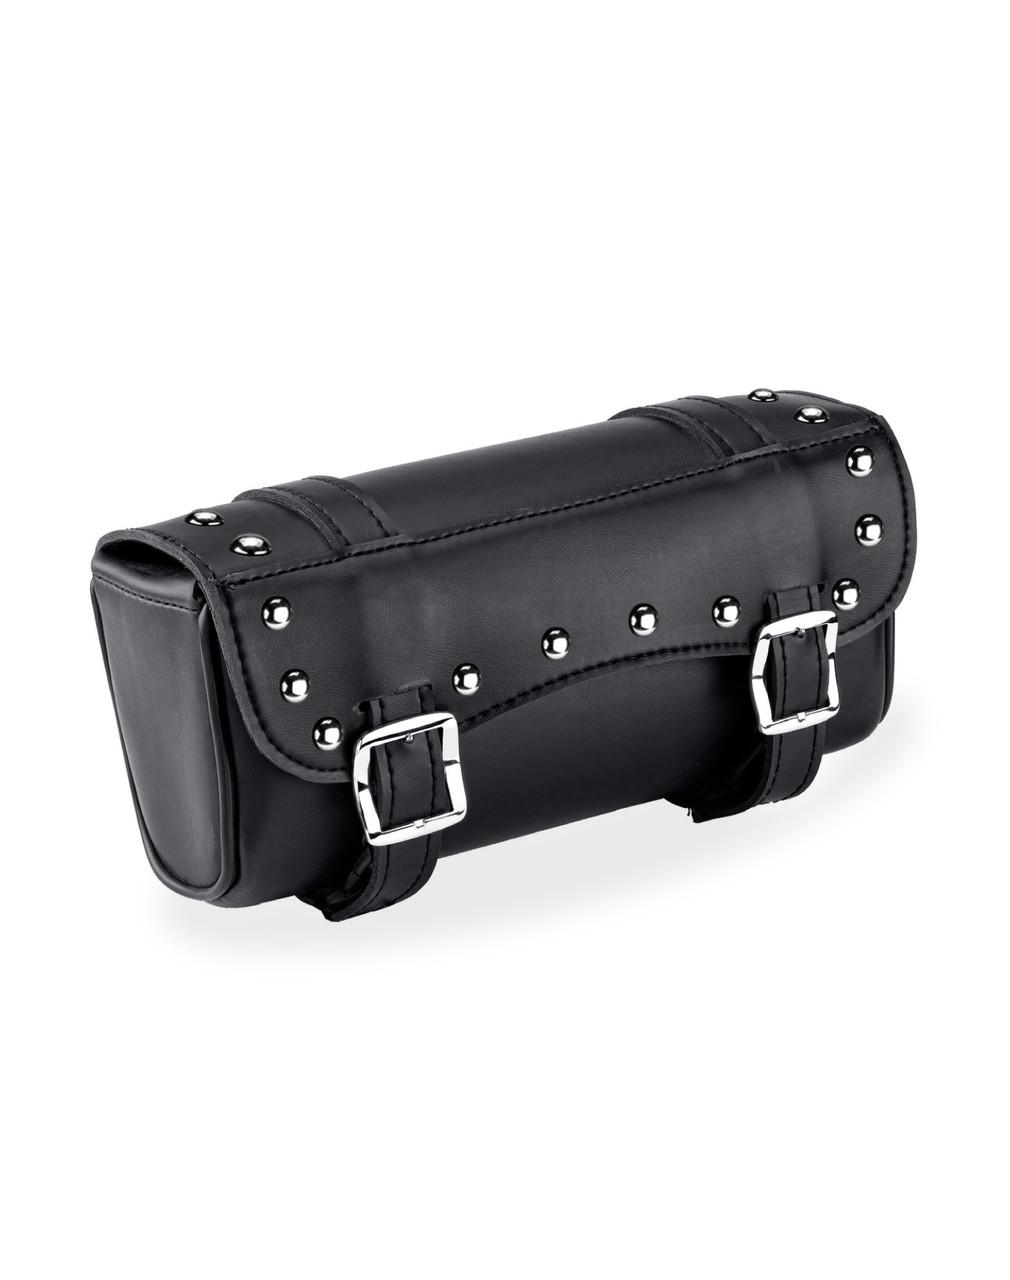 VikingBags Medium Universal Studded Motorcycle Tool Bag Main View